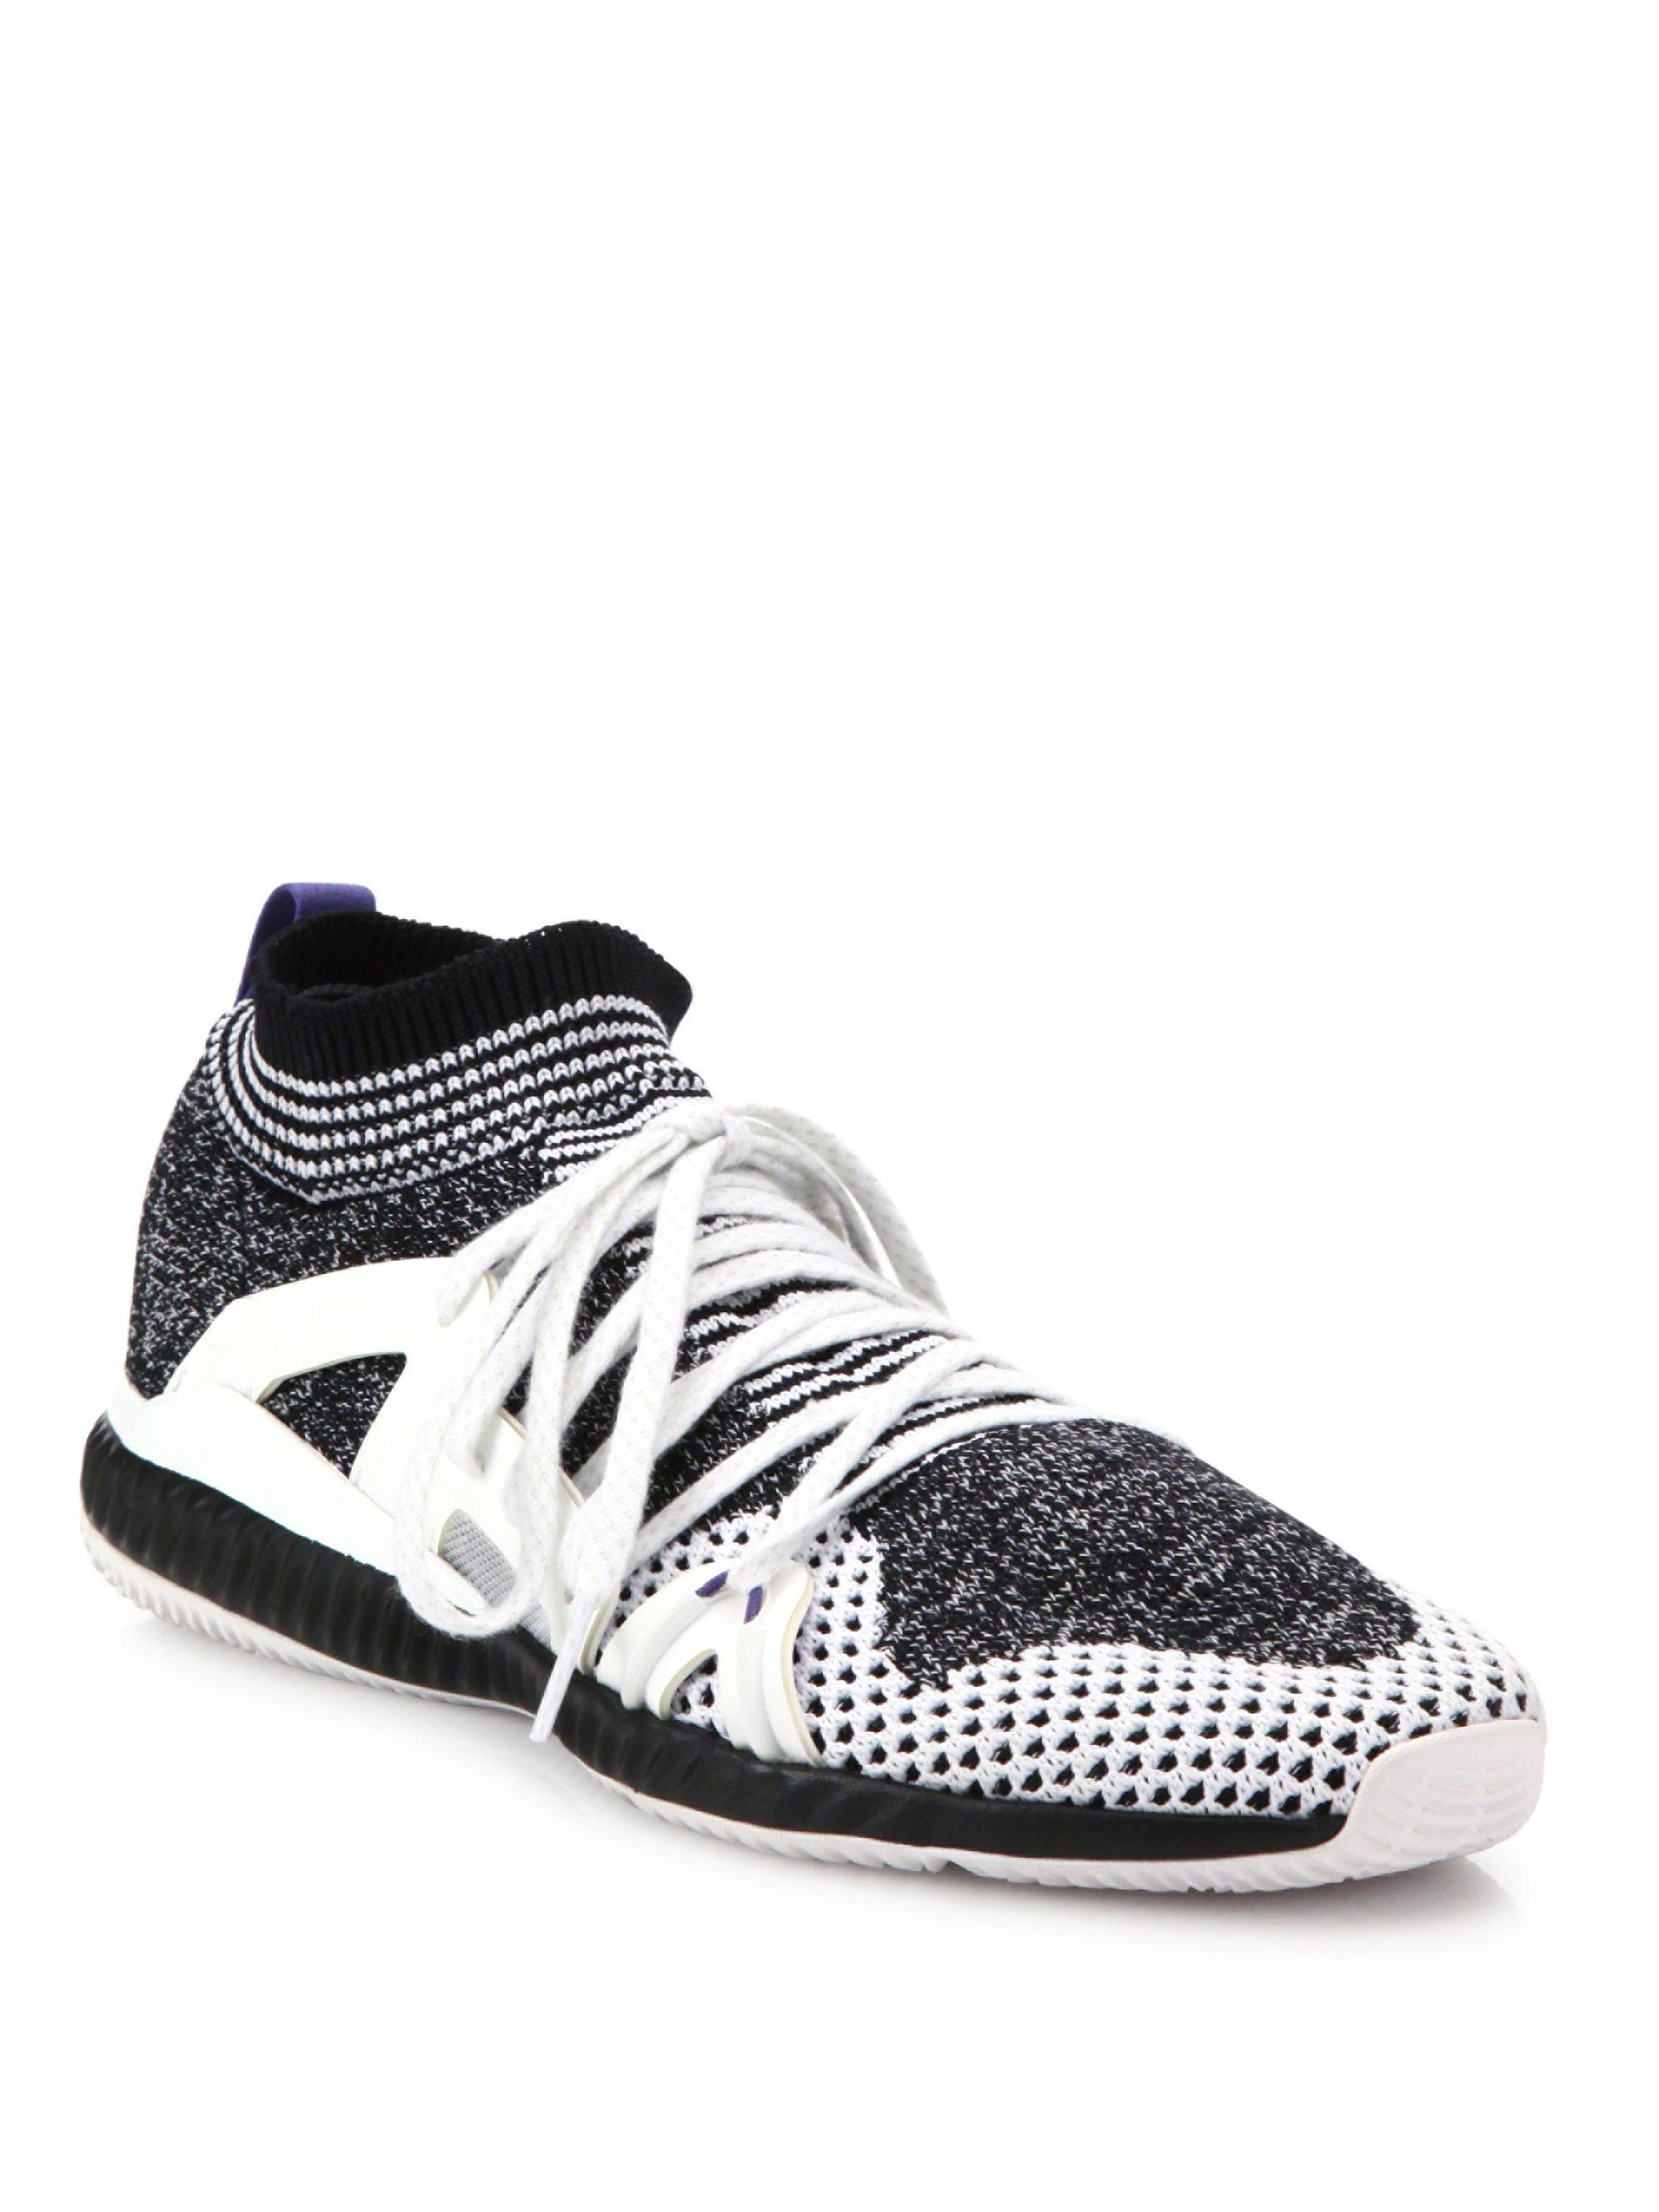 Adidas by Stella McCartney Lyst crazymove Bounce Trainer zapatillas